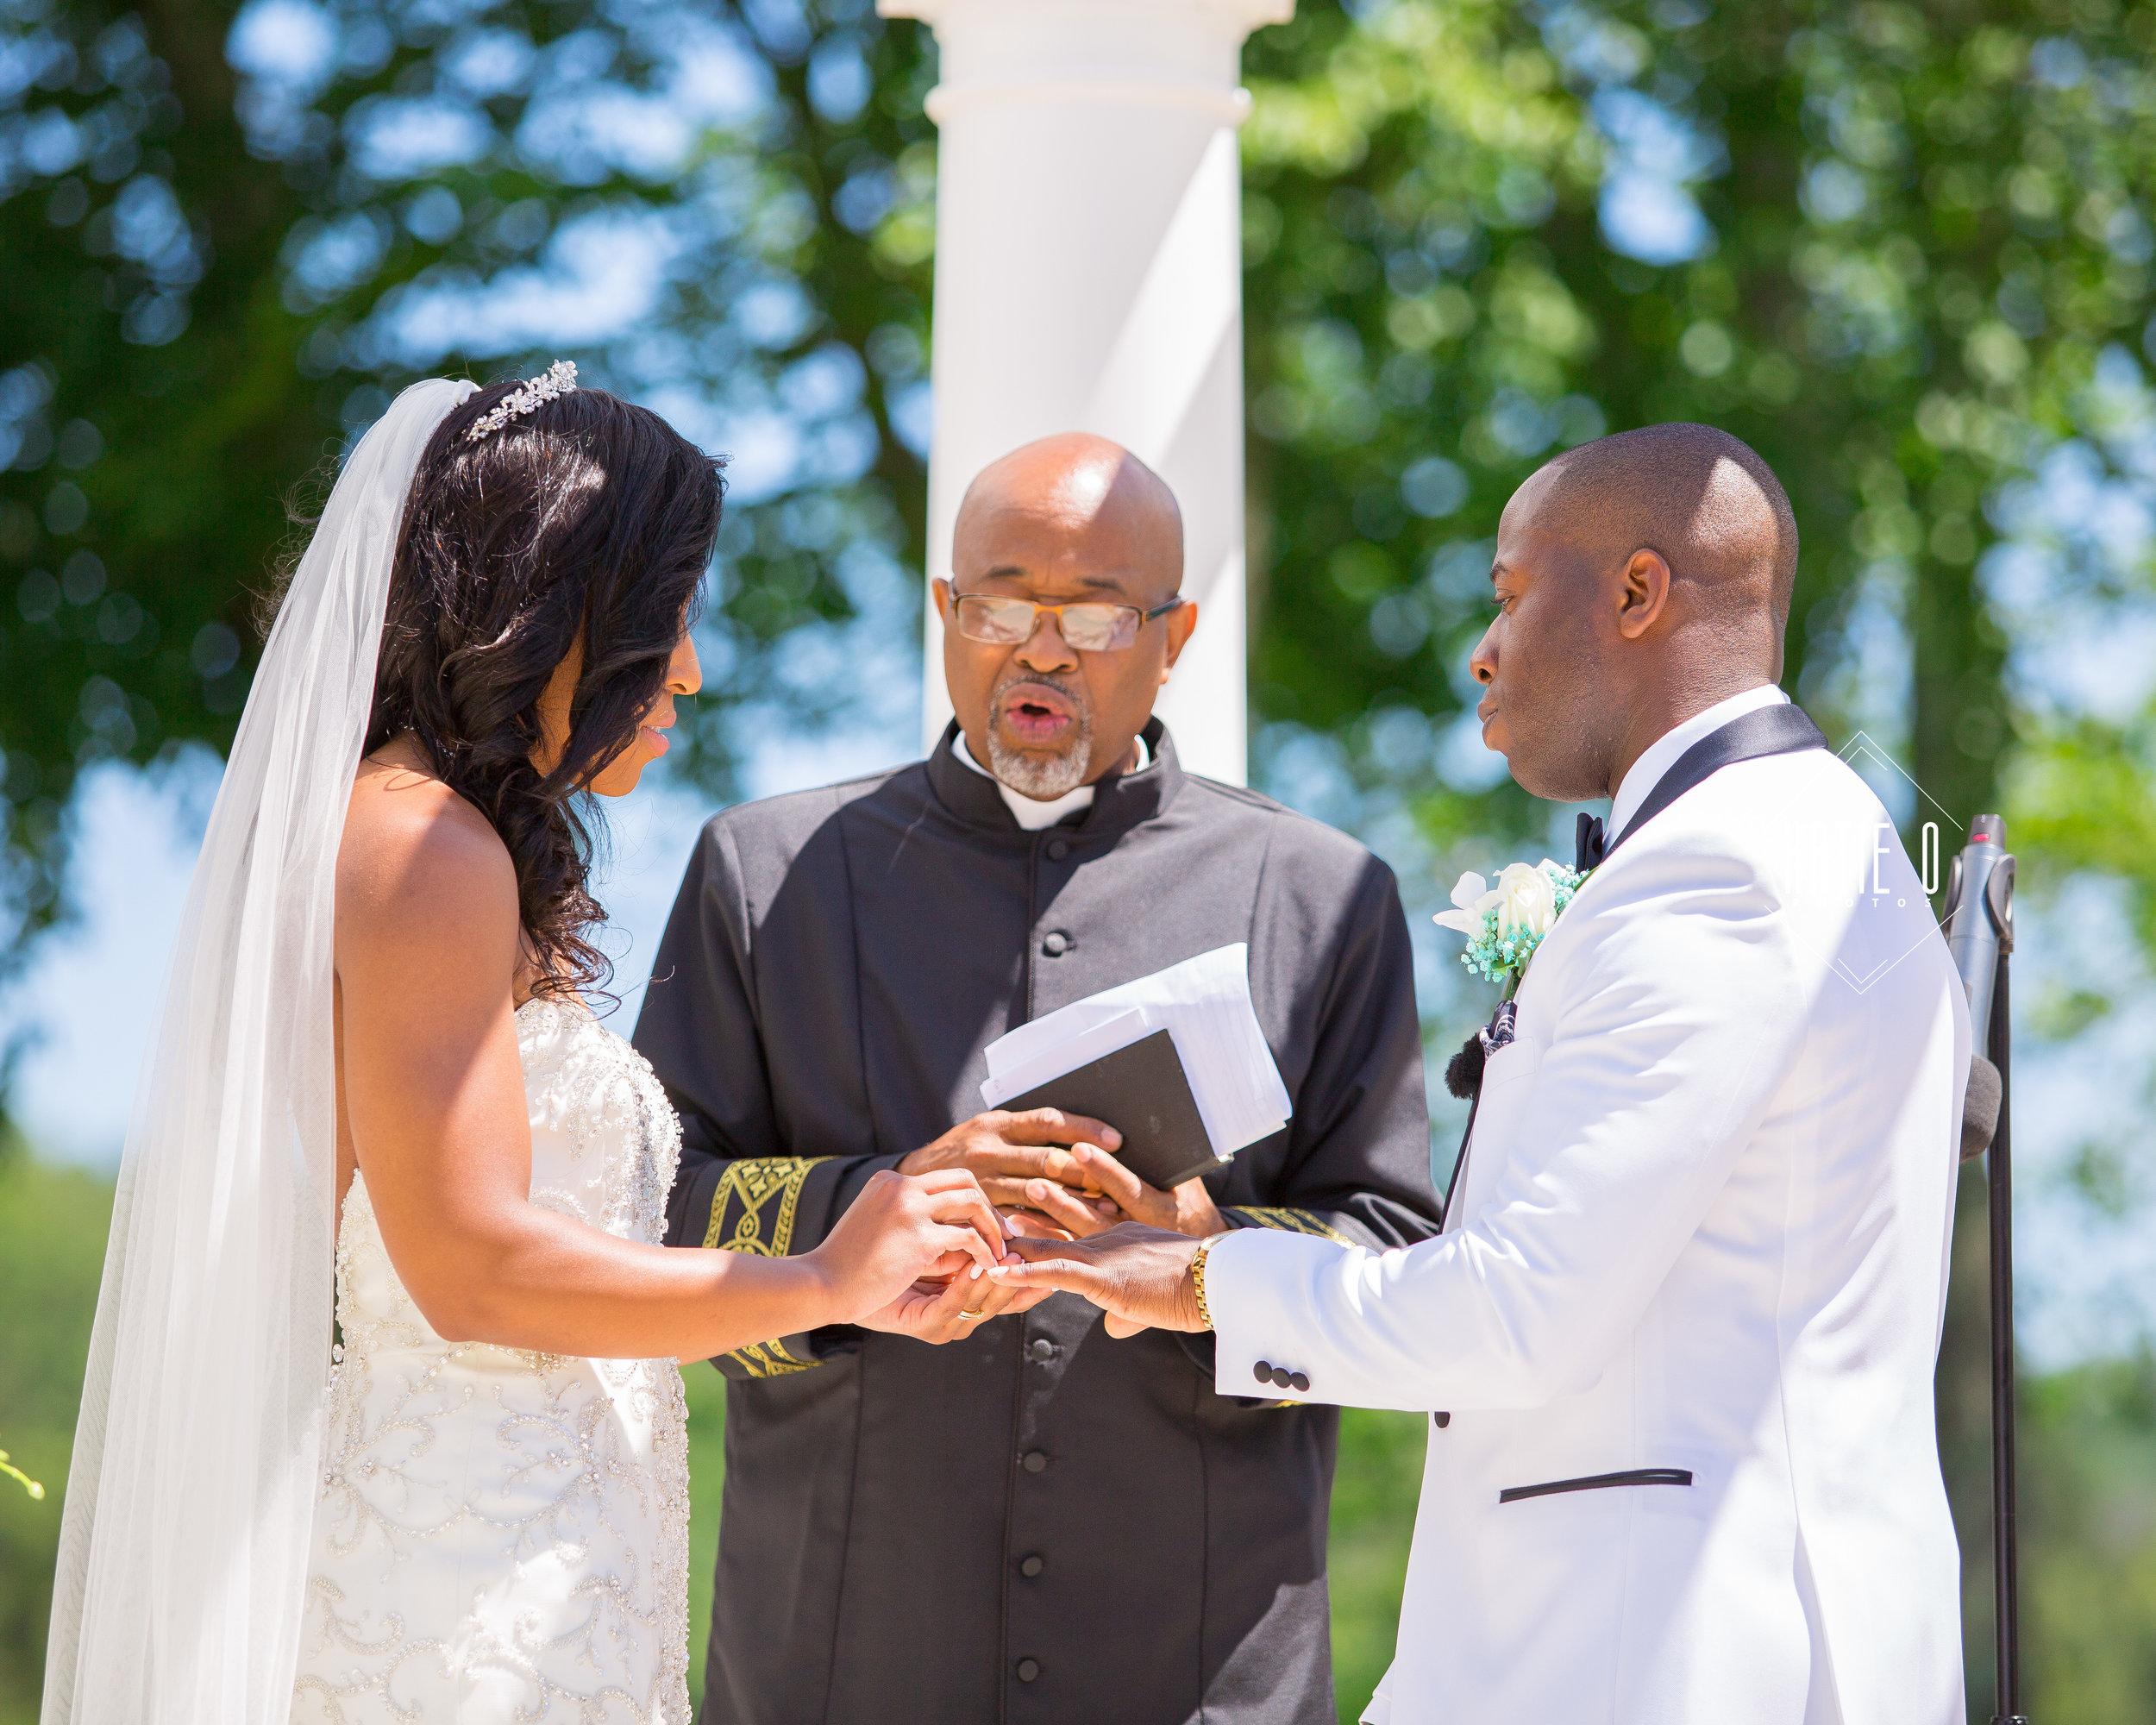 CT-WEDDING-PHOTOGRAPHER-BLOG-21.jpg